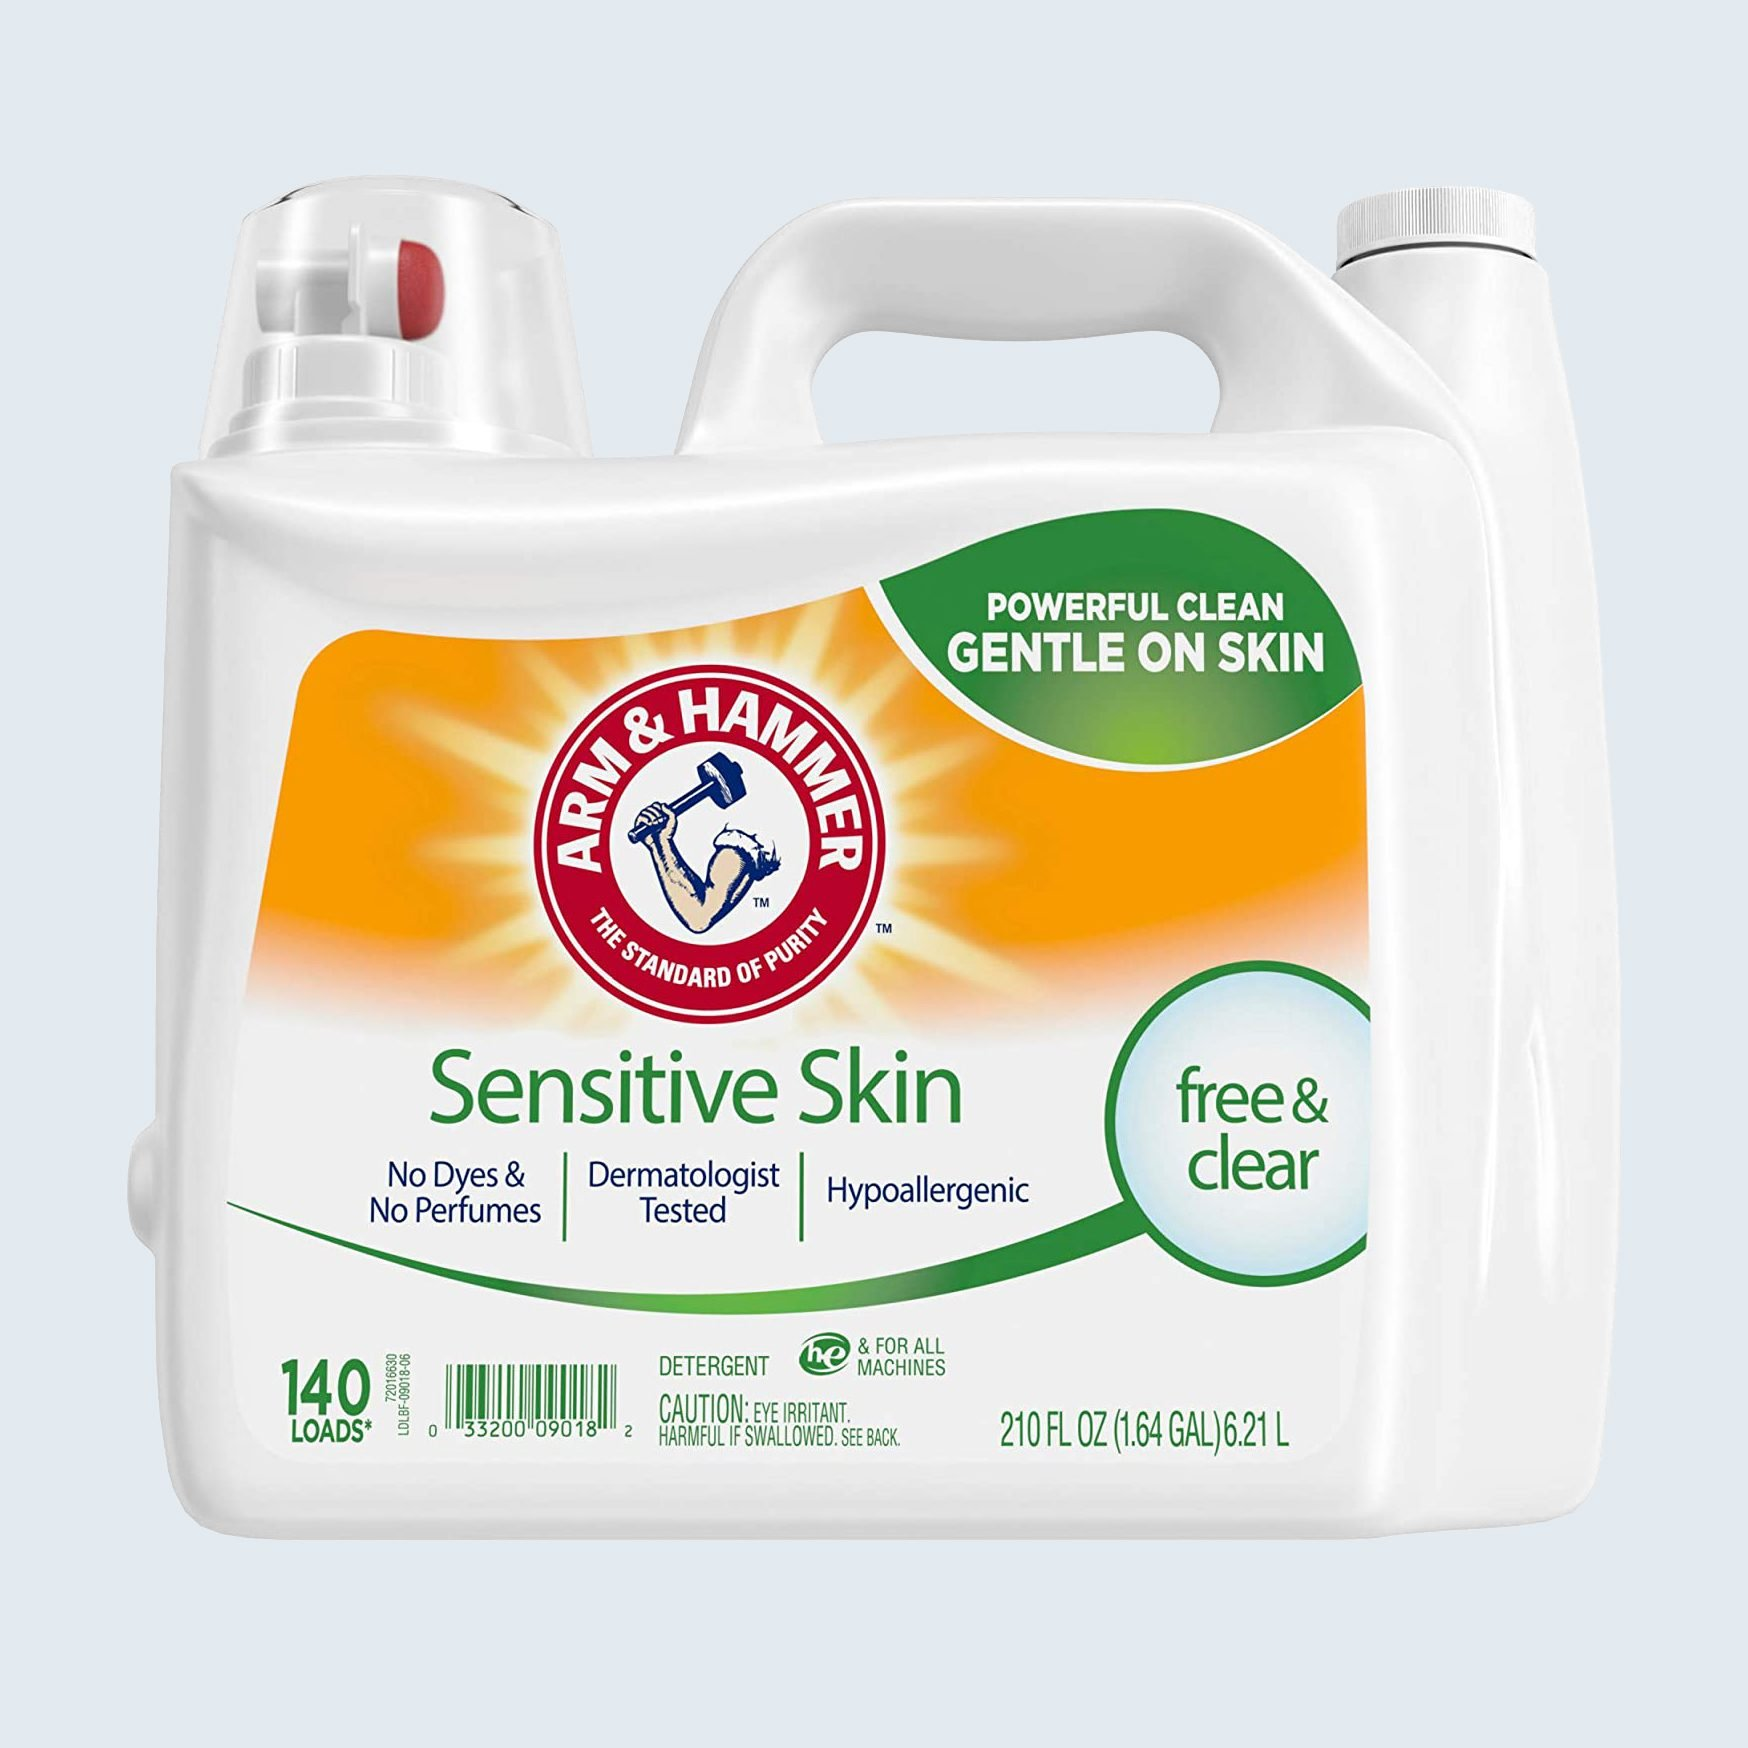 Arm & Hammer Sensitive Skin Free & Clear Detergent